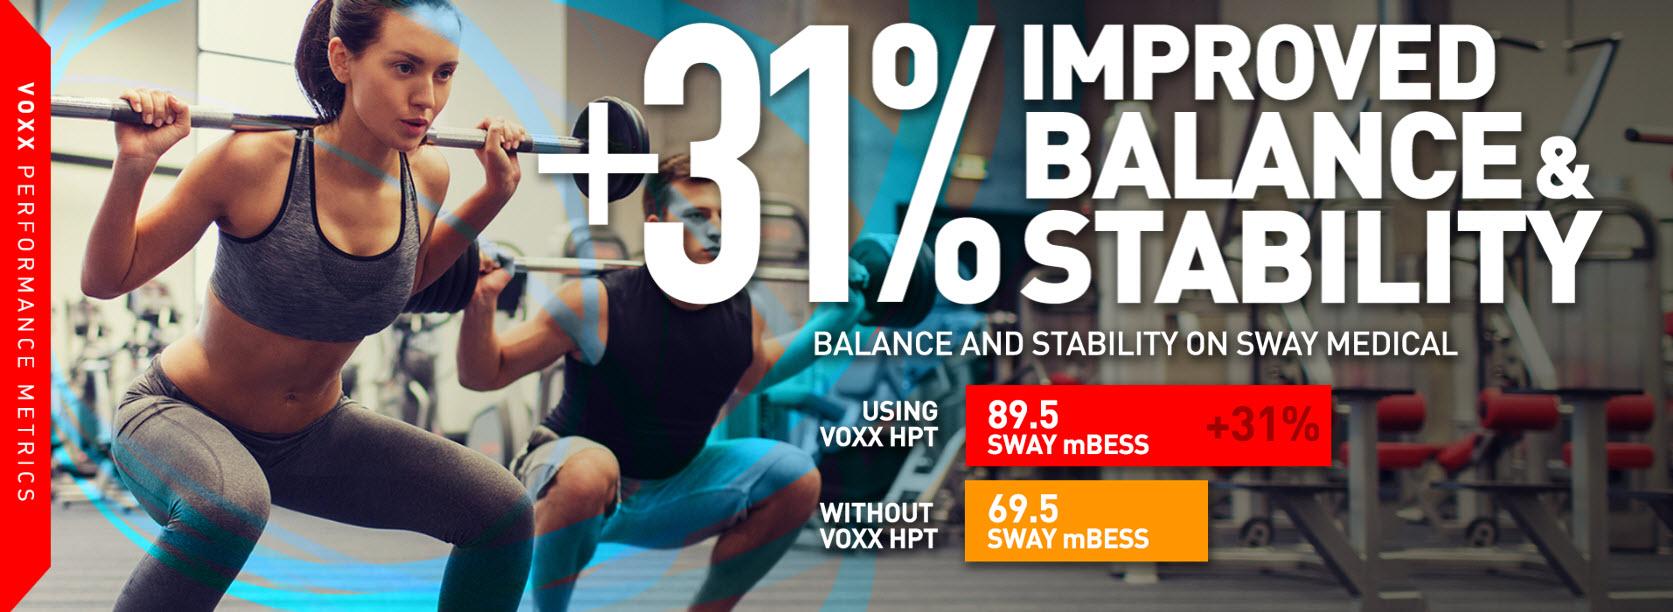 Voxx Better Balance Image